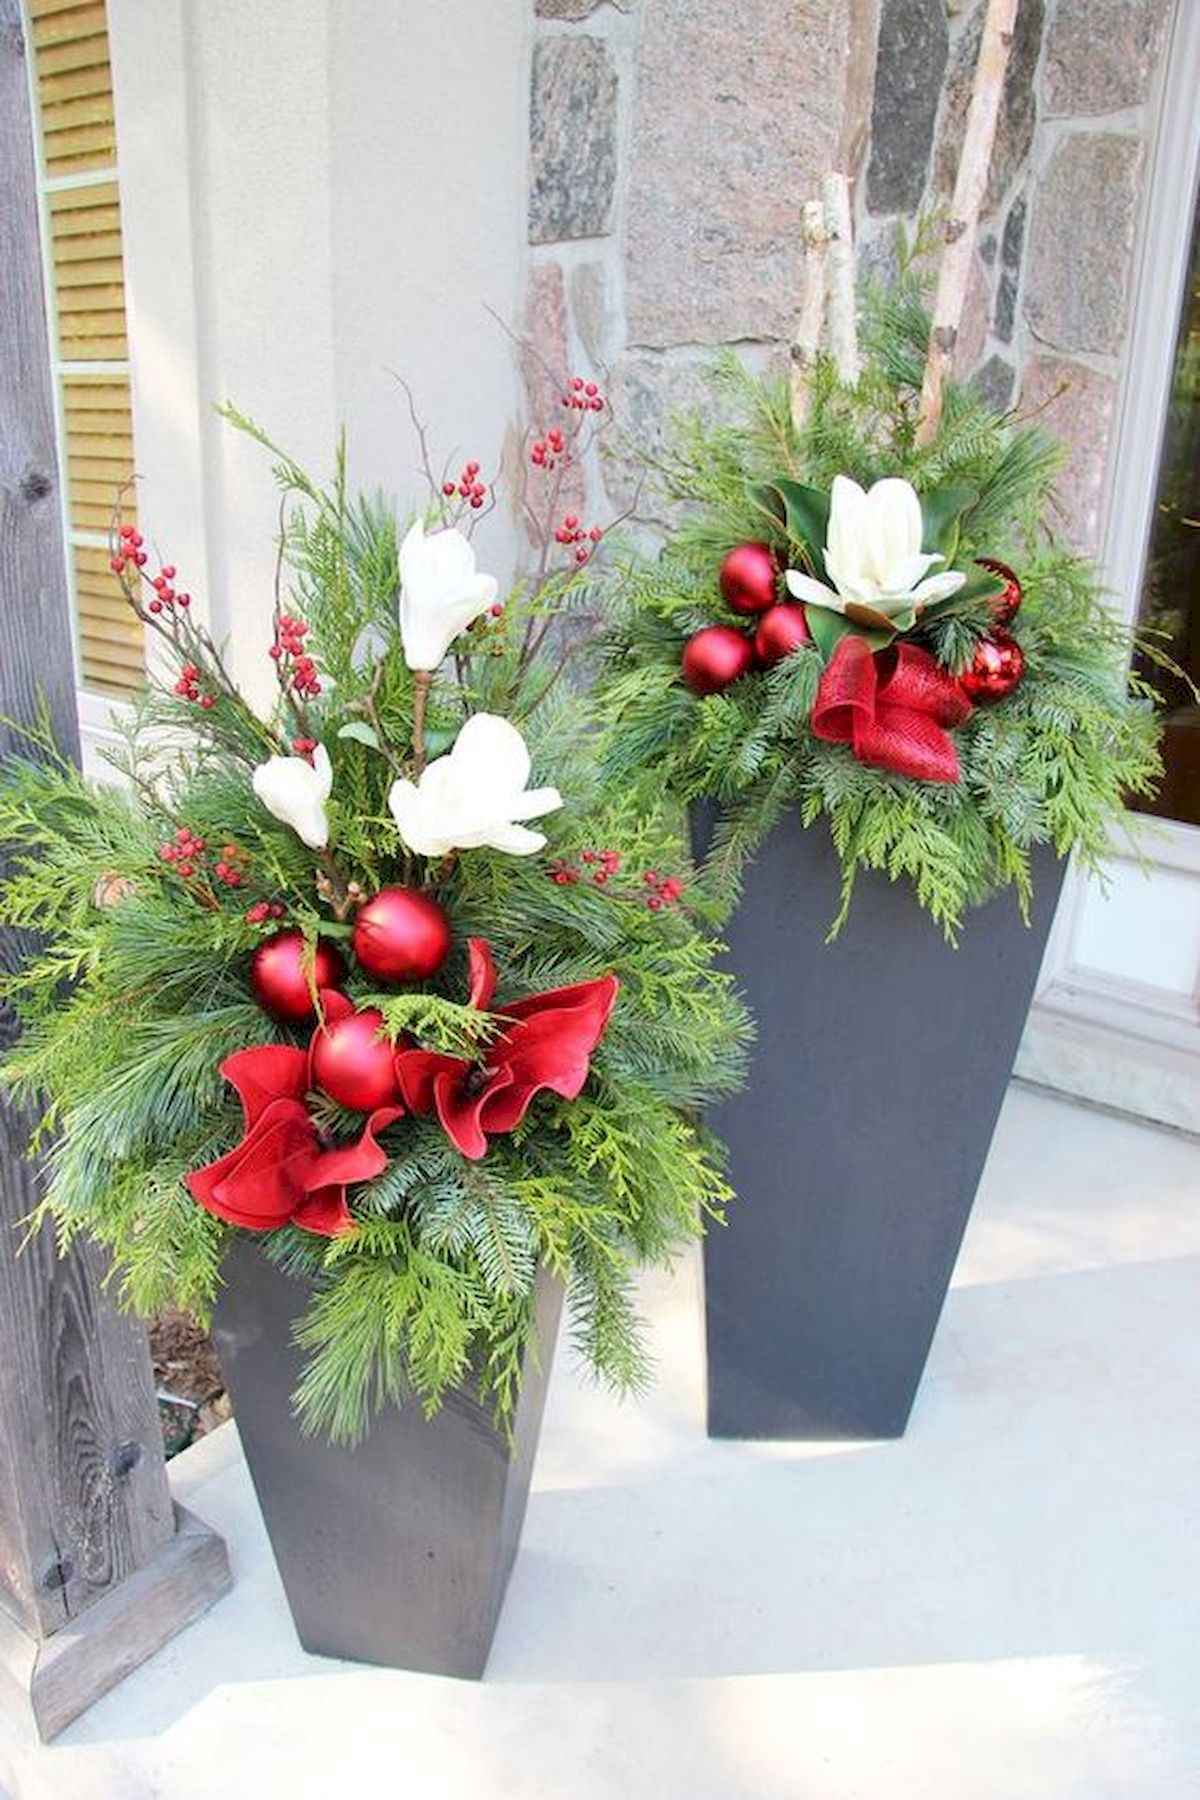 40 amazing outdoor christmas decorations ideas (14)